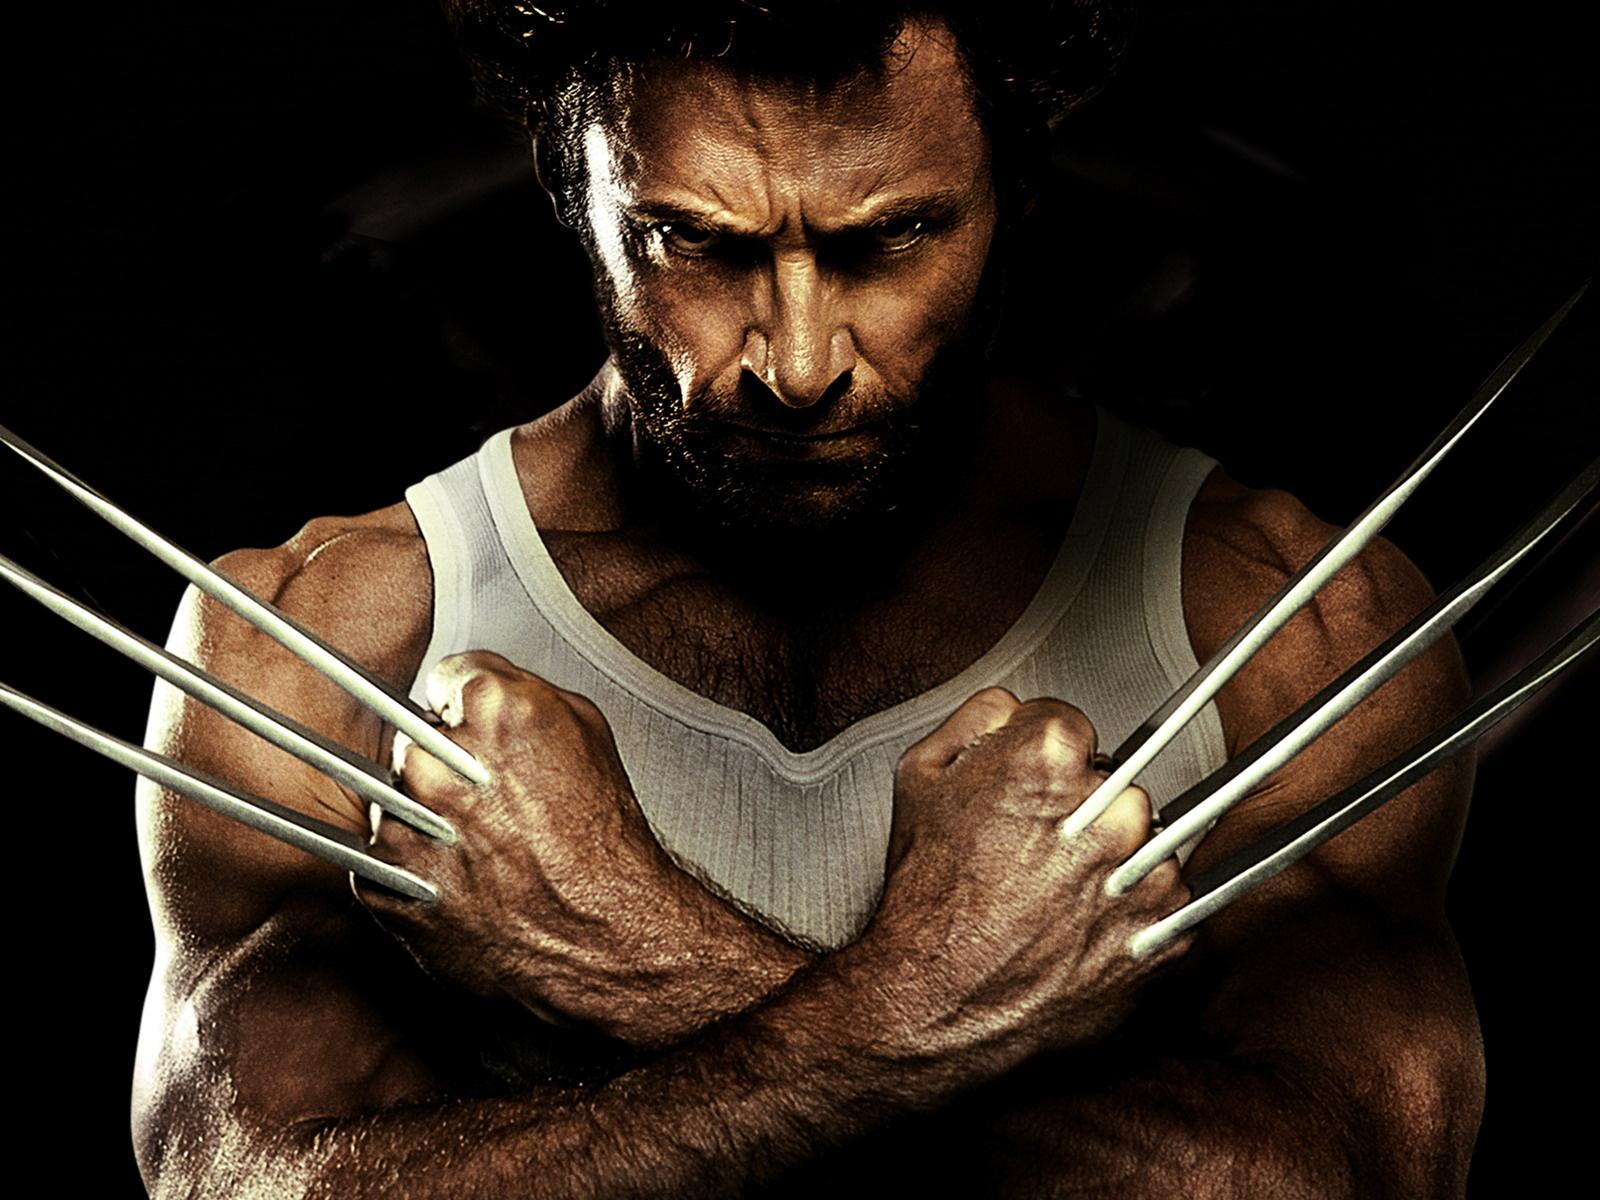 Hugh Jackman Logan In X Men Origins Wolverine 02 Wallpaper